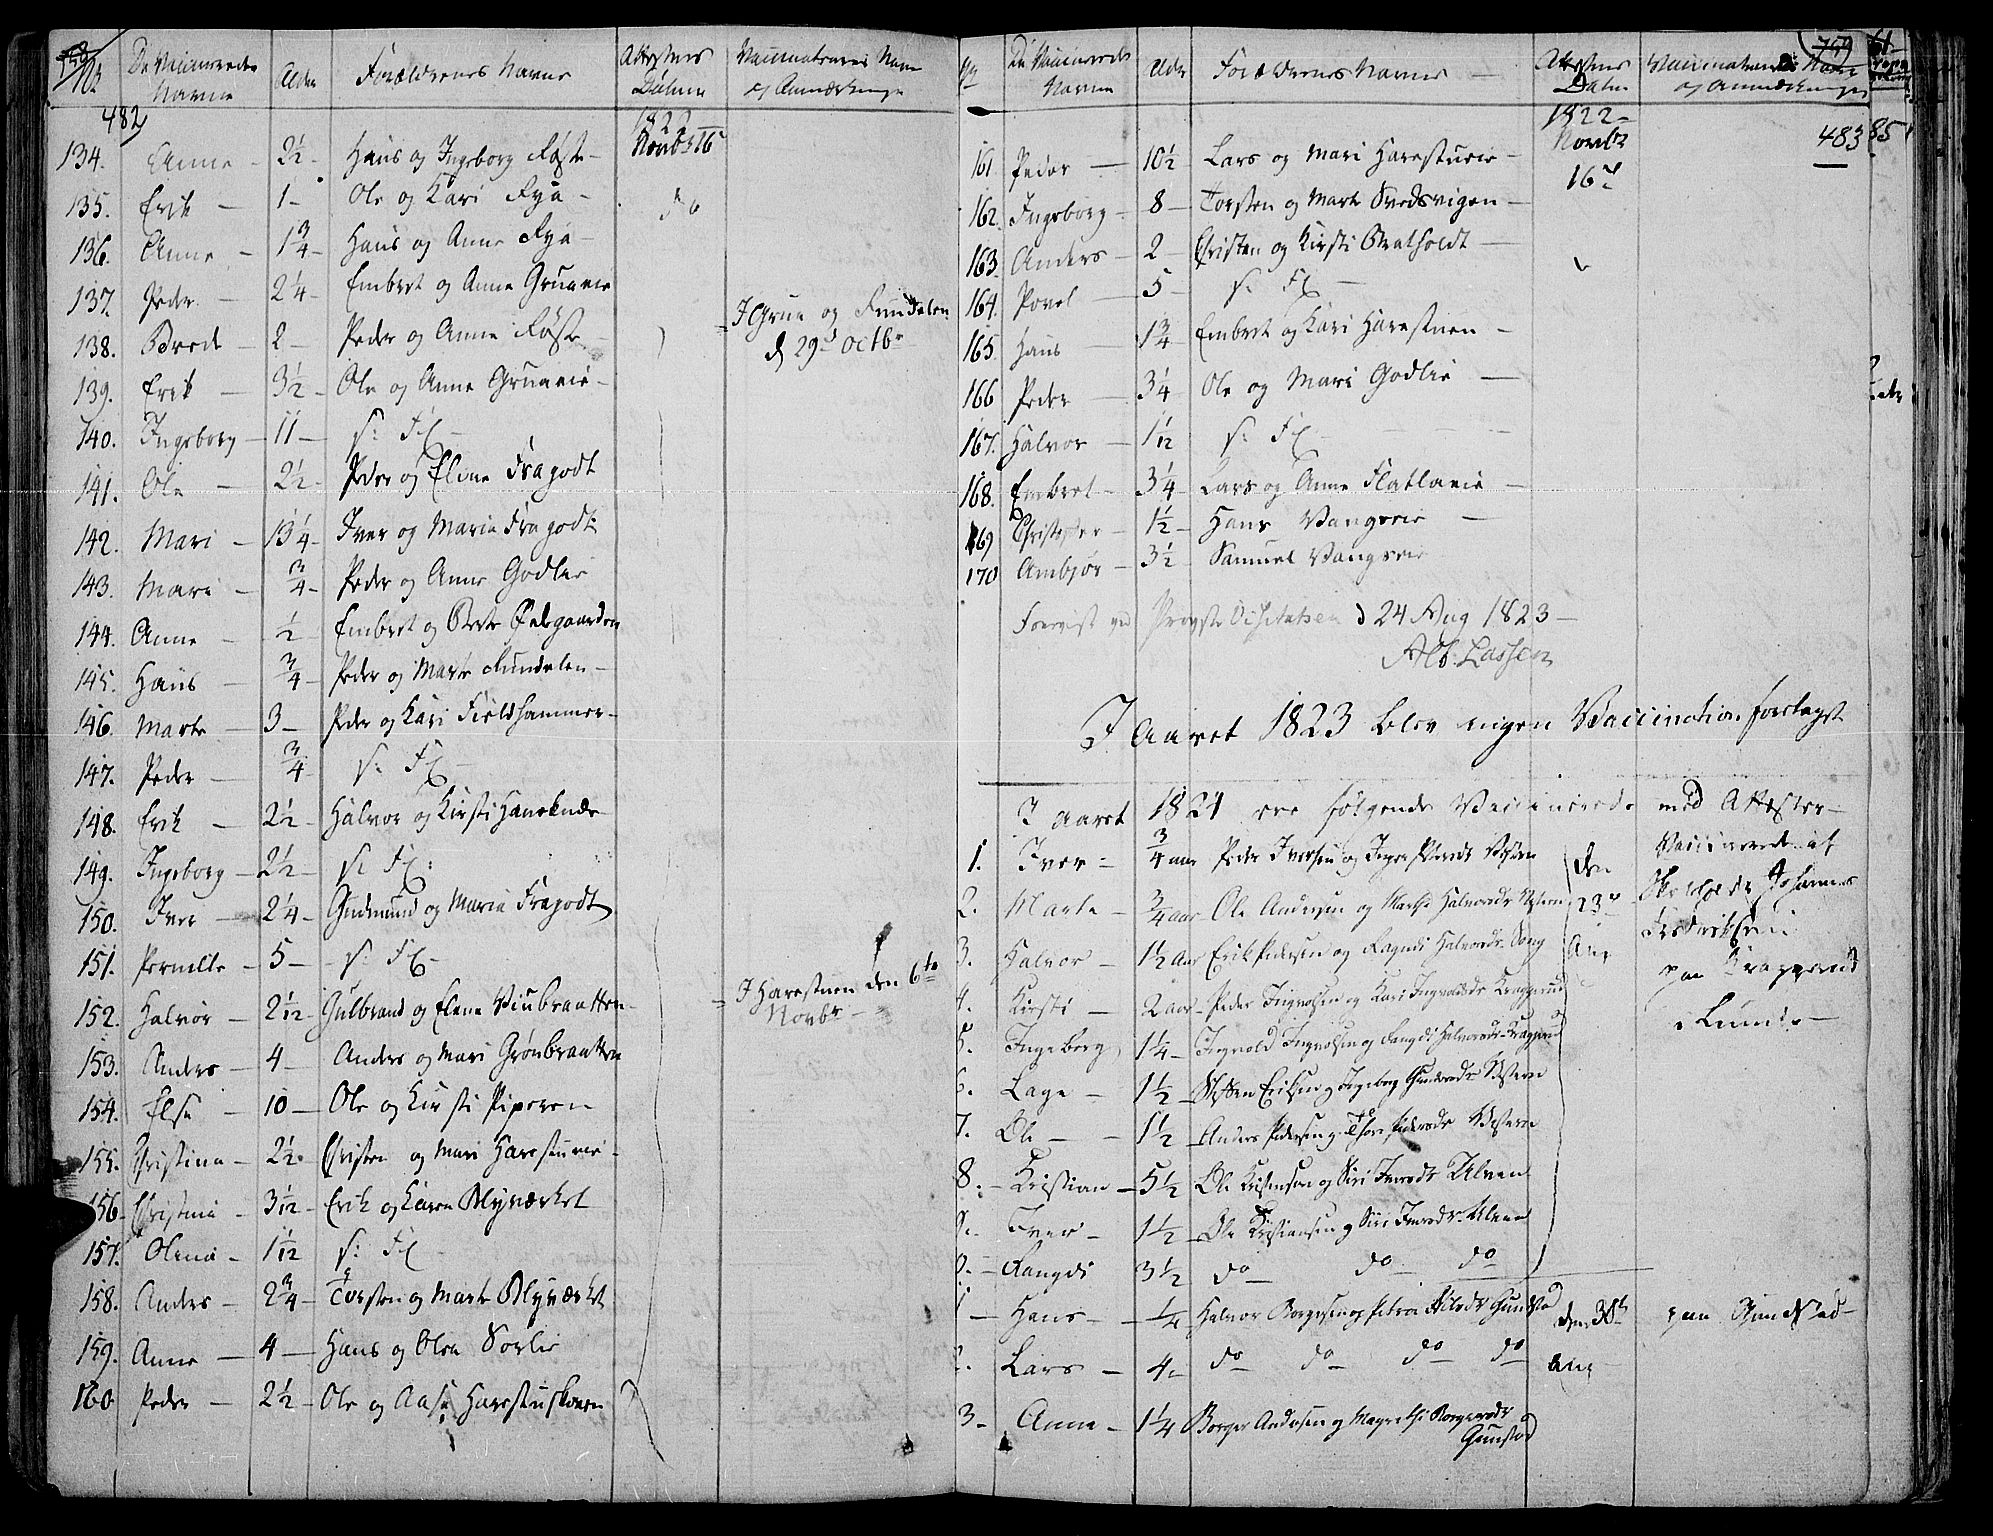 SAH, Jevnaker prestekontor, Ministerialbok nr. 4, 1800-1861, s. 482-483